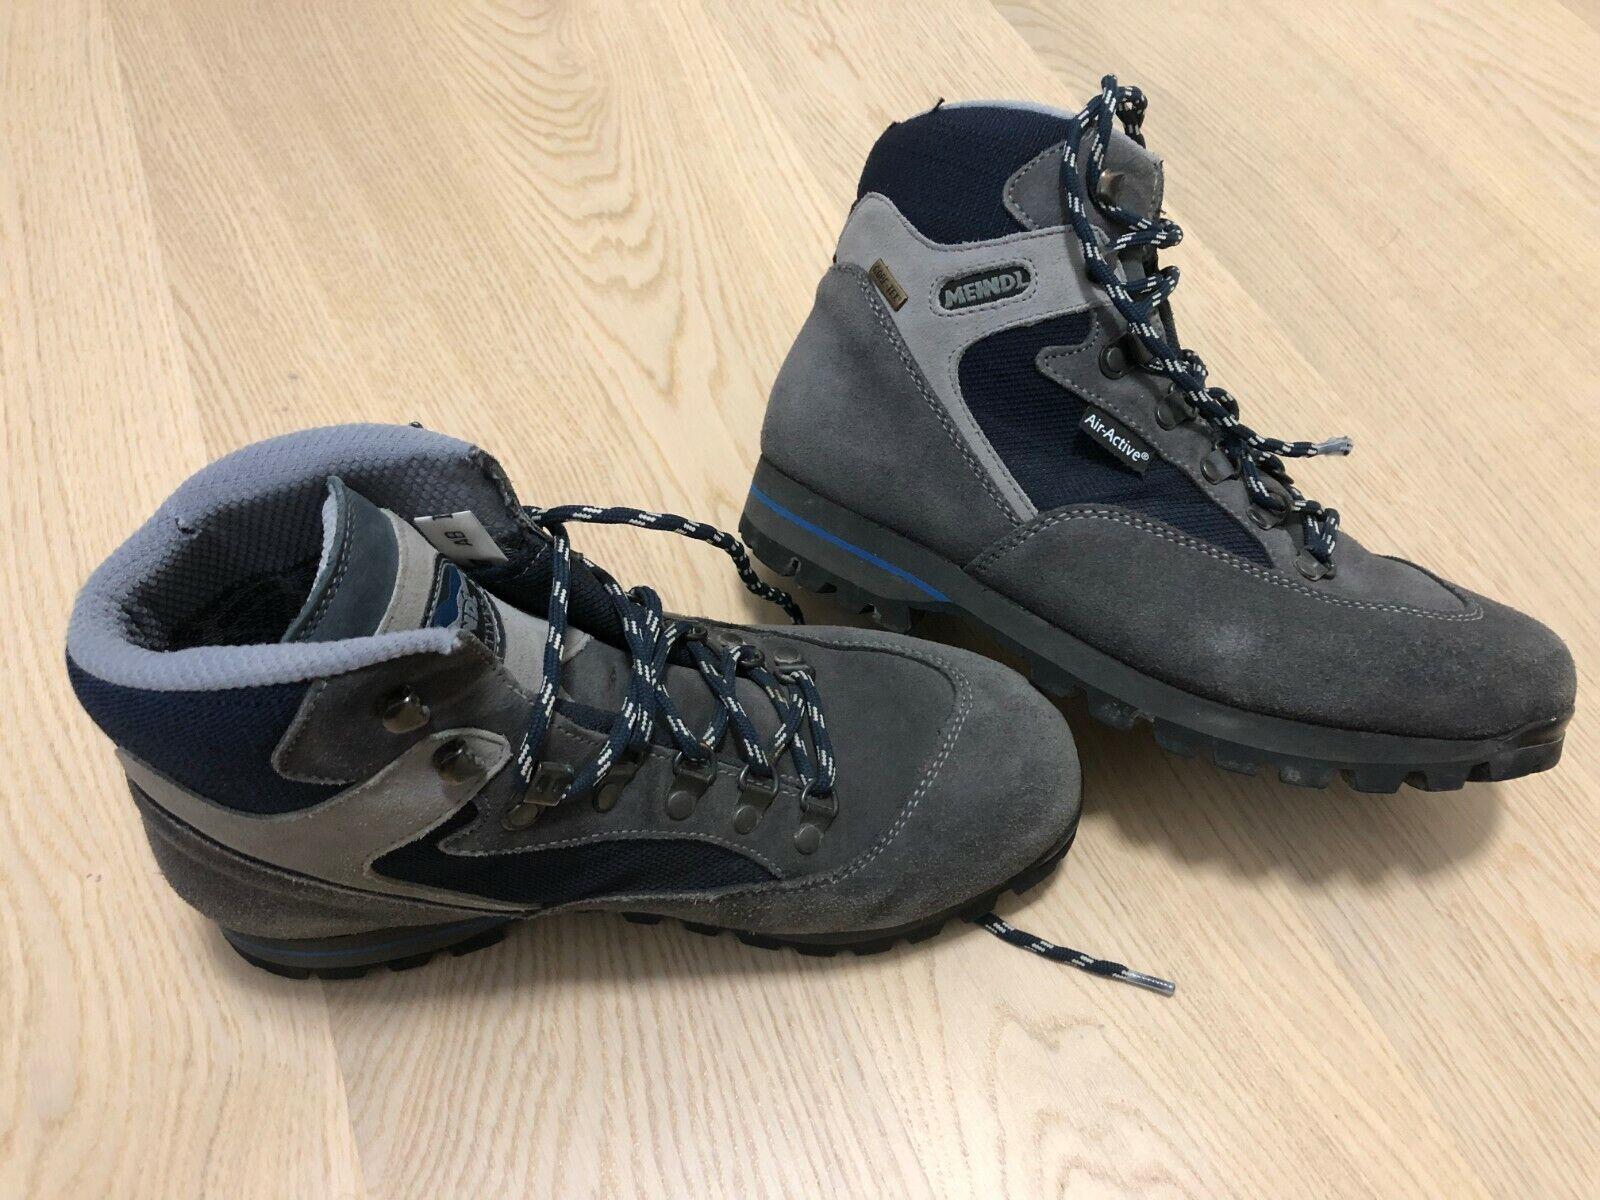 Meindl  gore tex Hiking approach zapatos trekking botas UE 41  mas preferencial